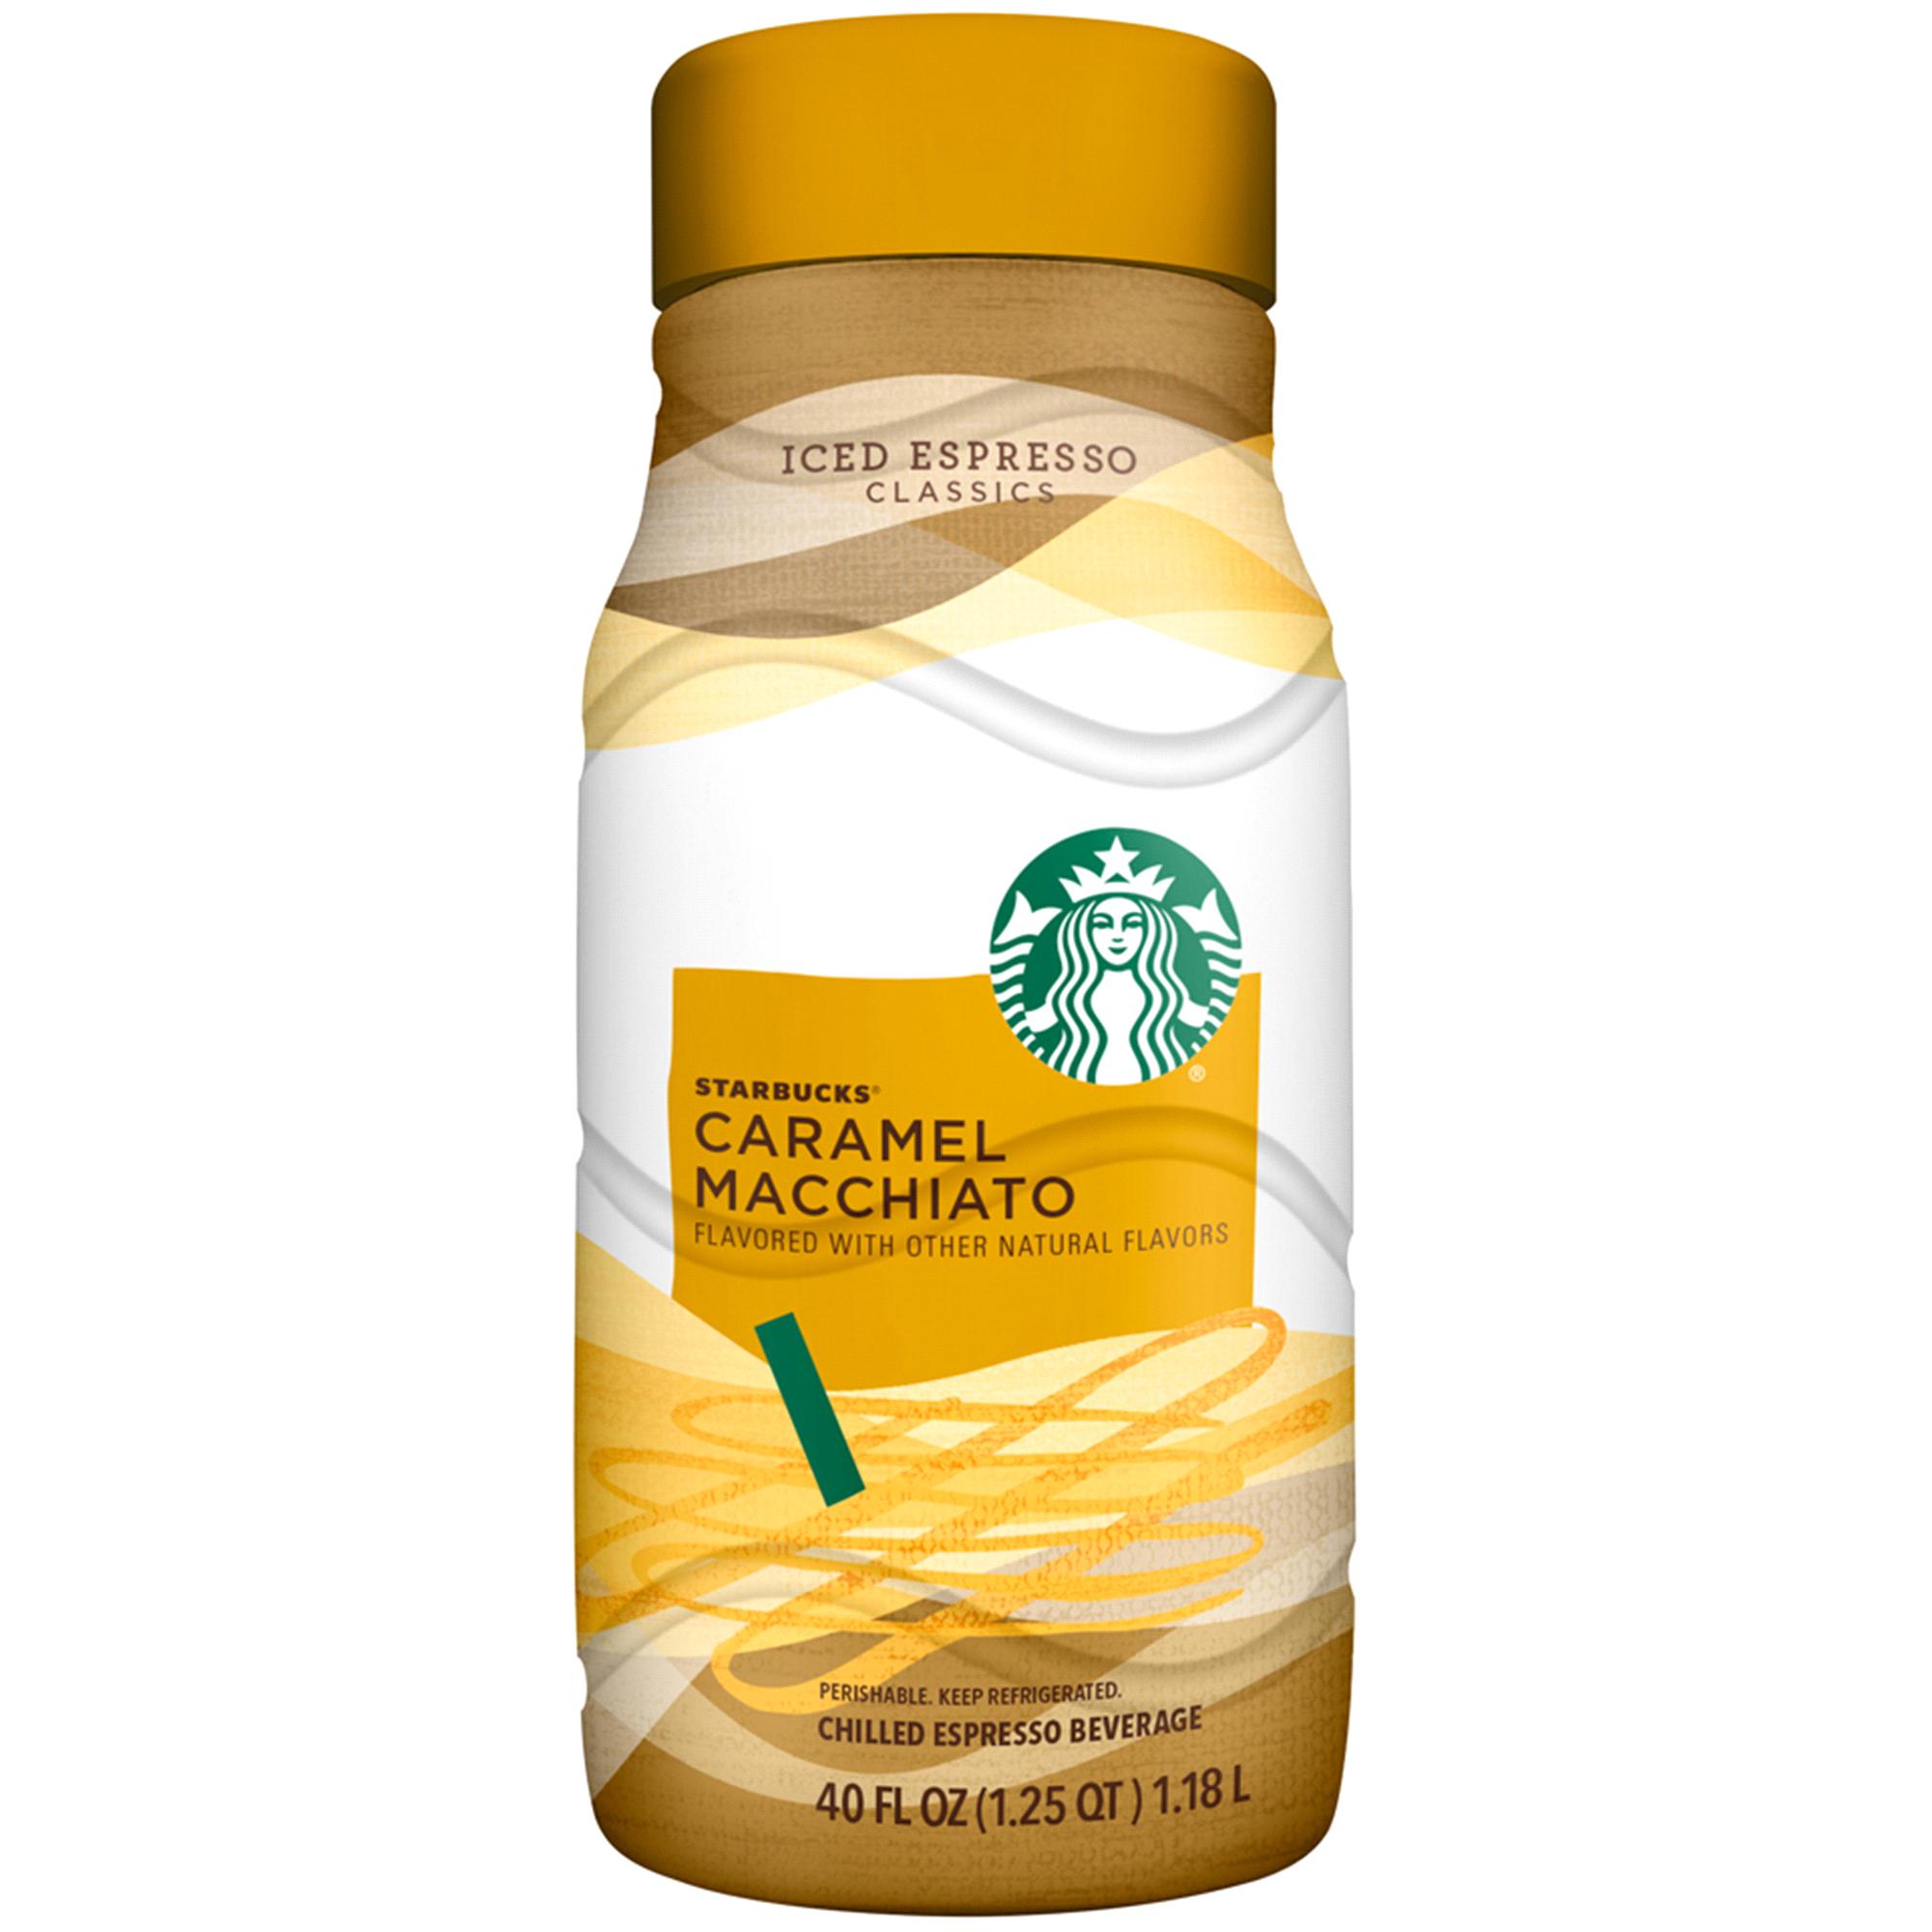 Starbucks® Caramel Macchiato Chilled Espresso Beverage 40 fl oz ...